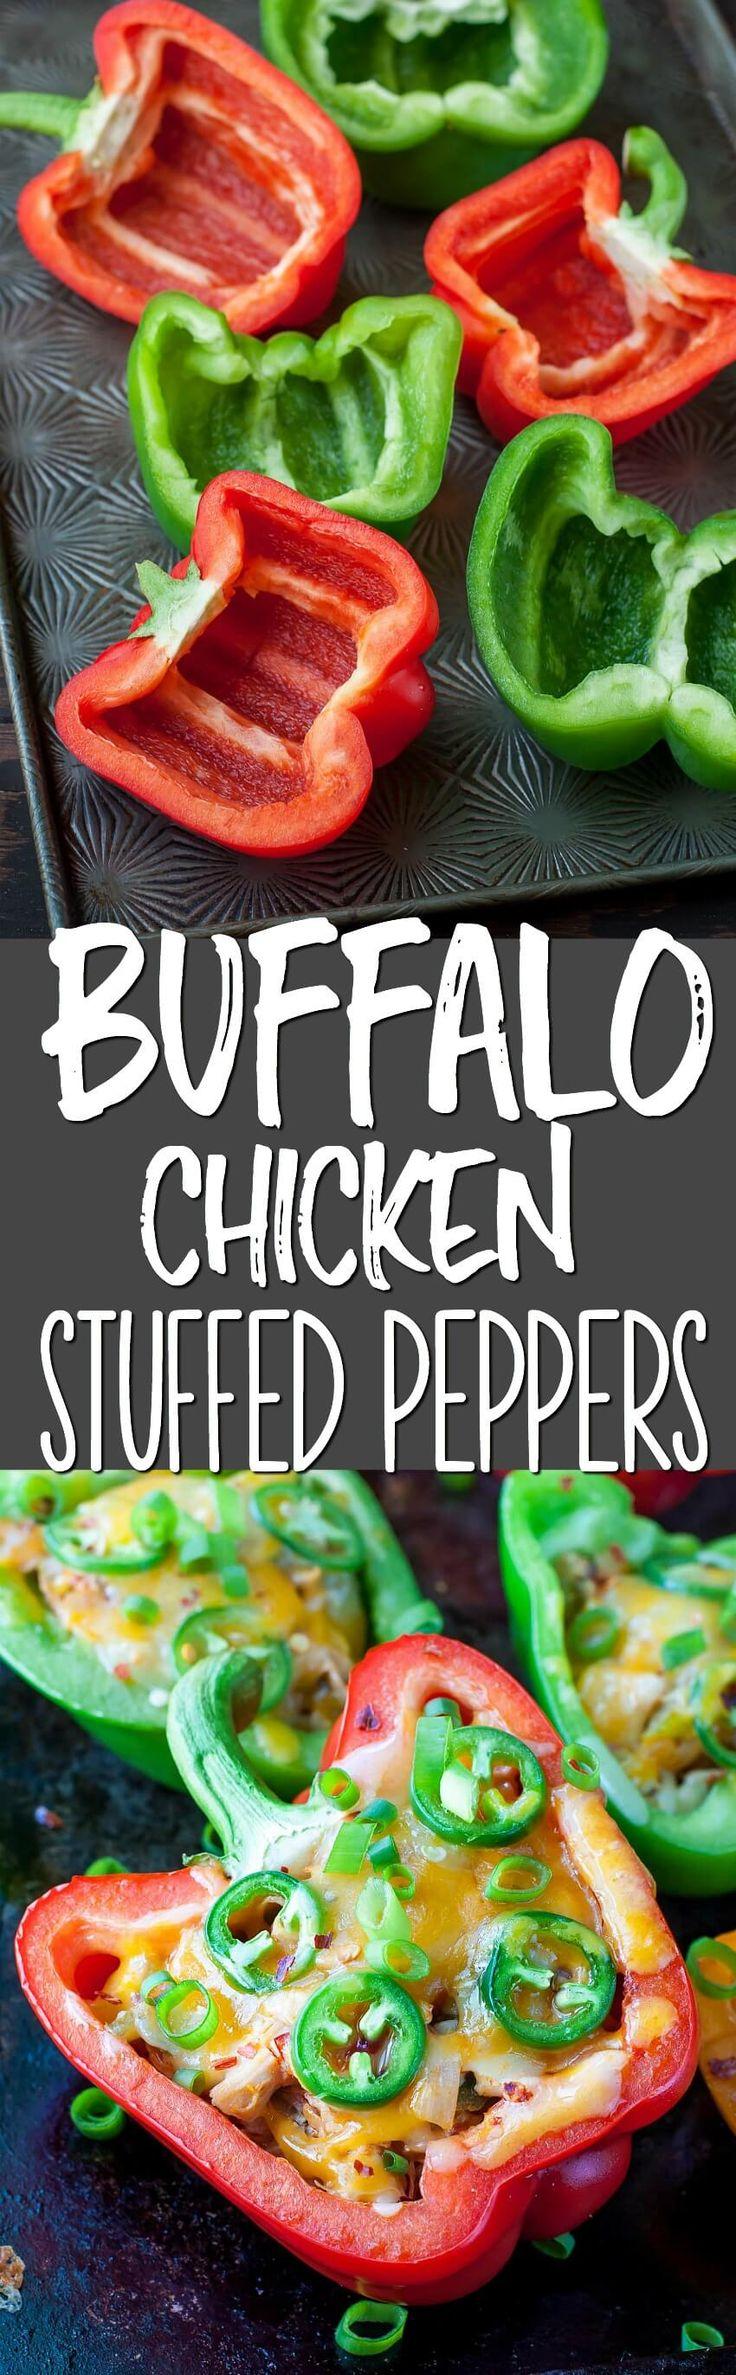 Cheesy Buffalo Chicken and Veggie Stuffed Peppers